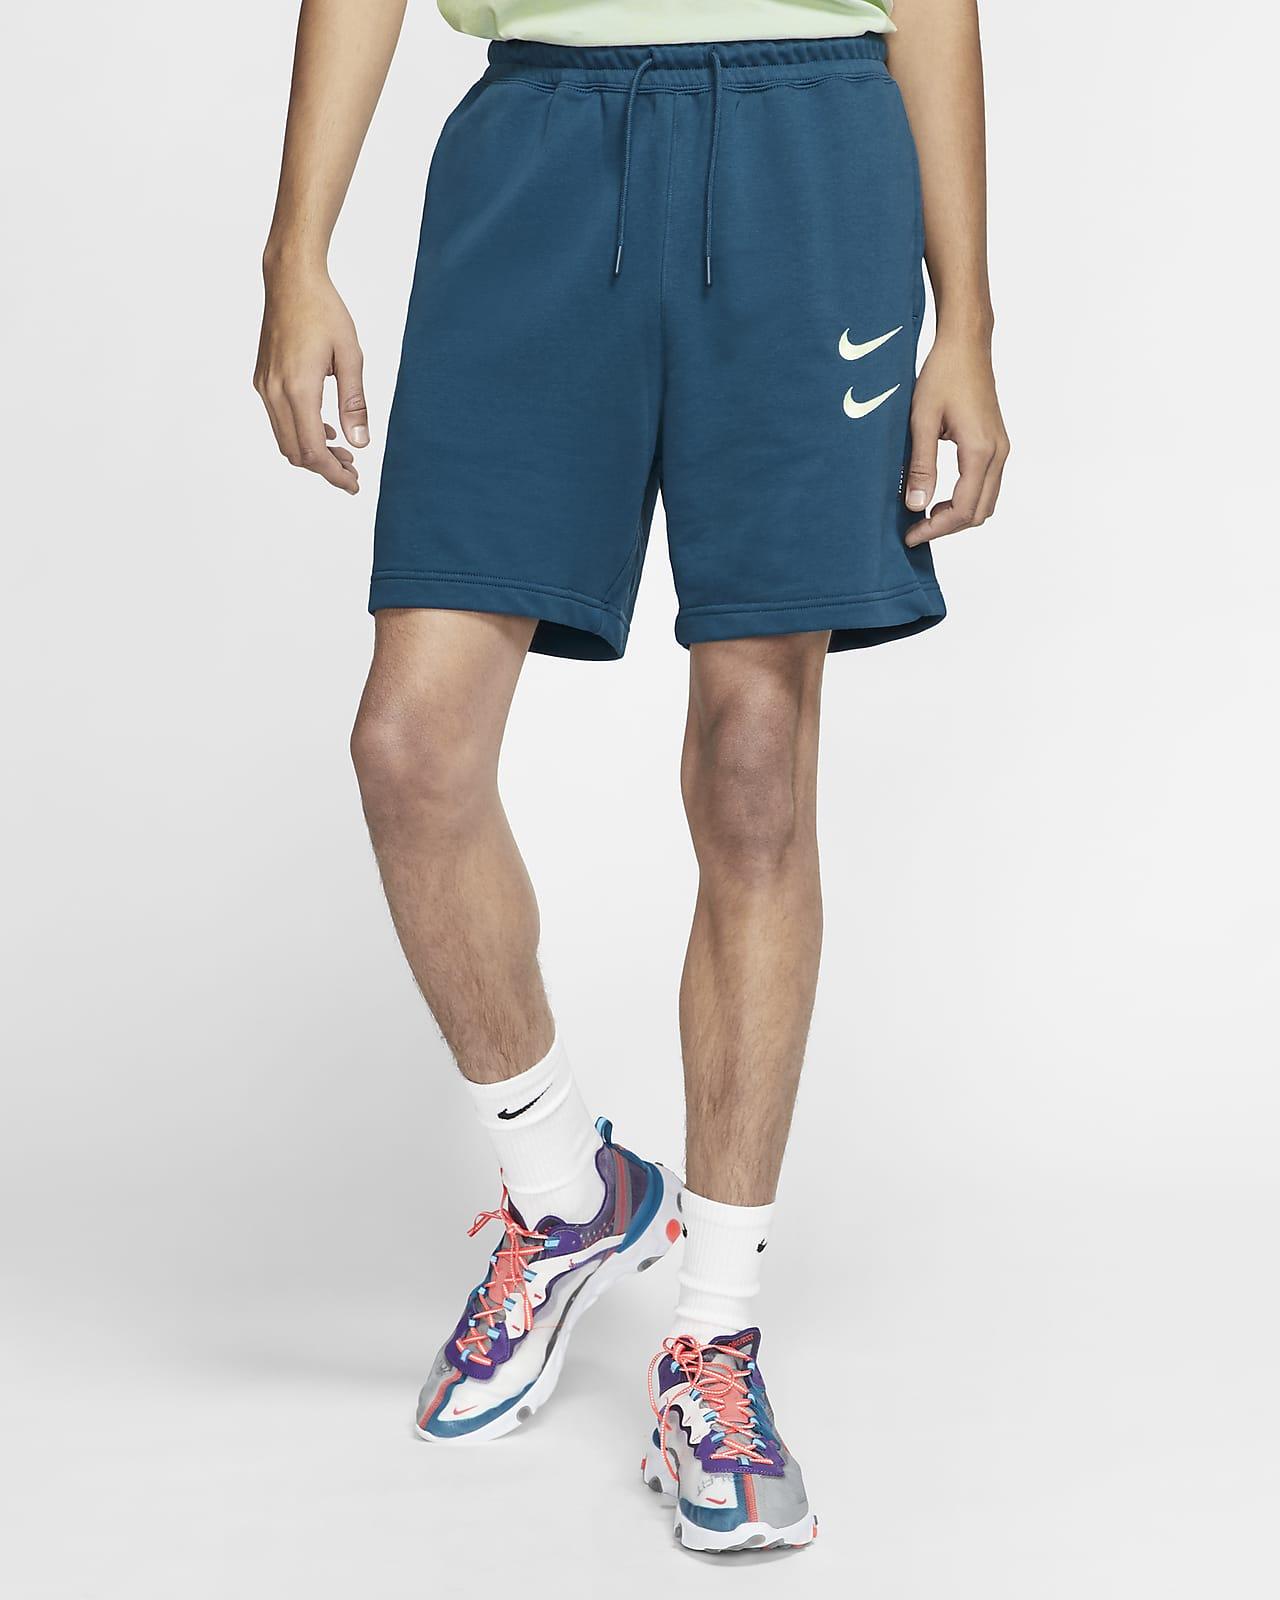 Birmania Goteo personal  Nike Sportswear Swoosh Pantalón corto de tejido French terry - Hombre. Nike  ES